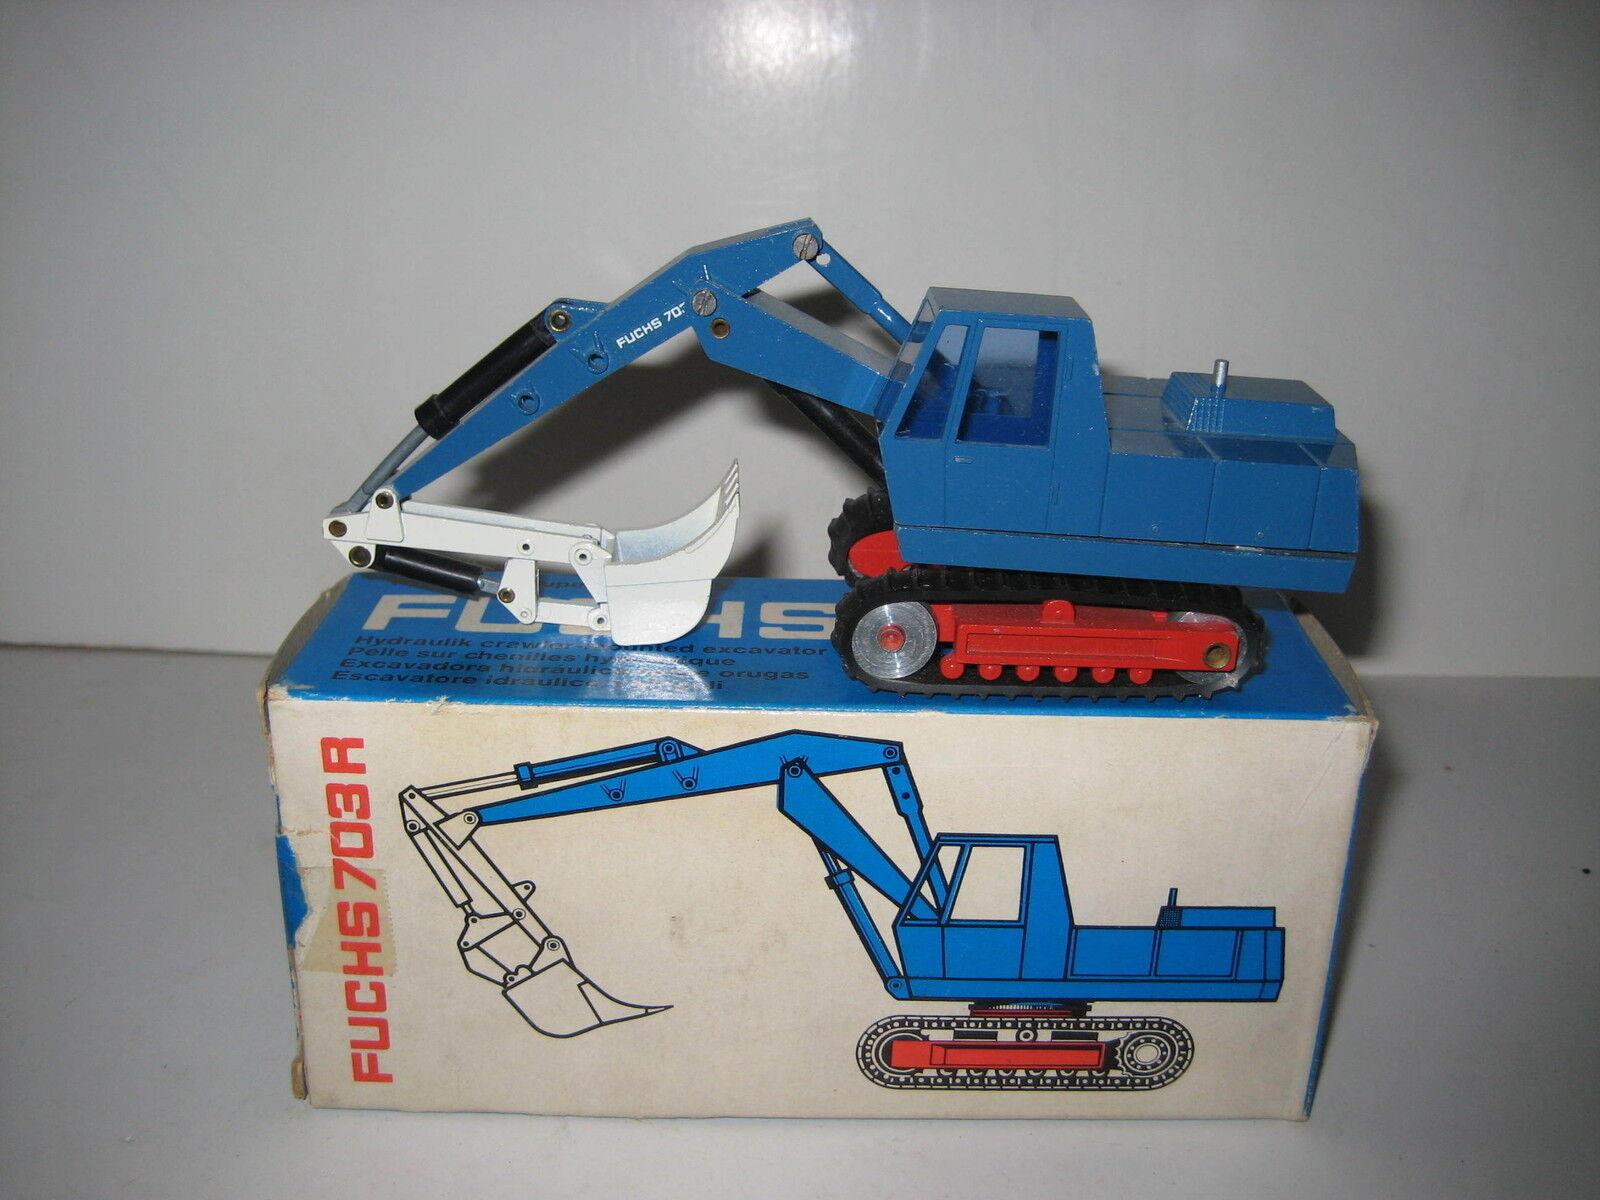 FUCHS 703r excavator backhoe loaders caterpillar  102.2 nzg 1 50 EMB. orig